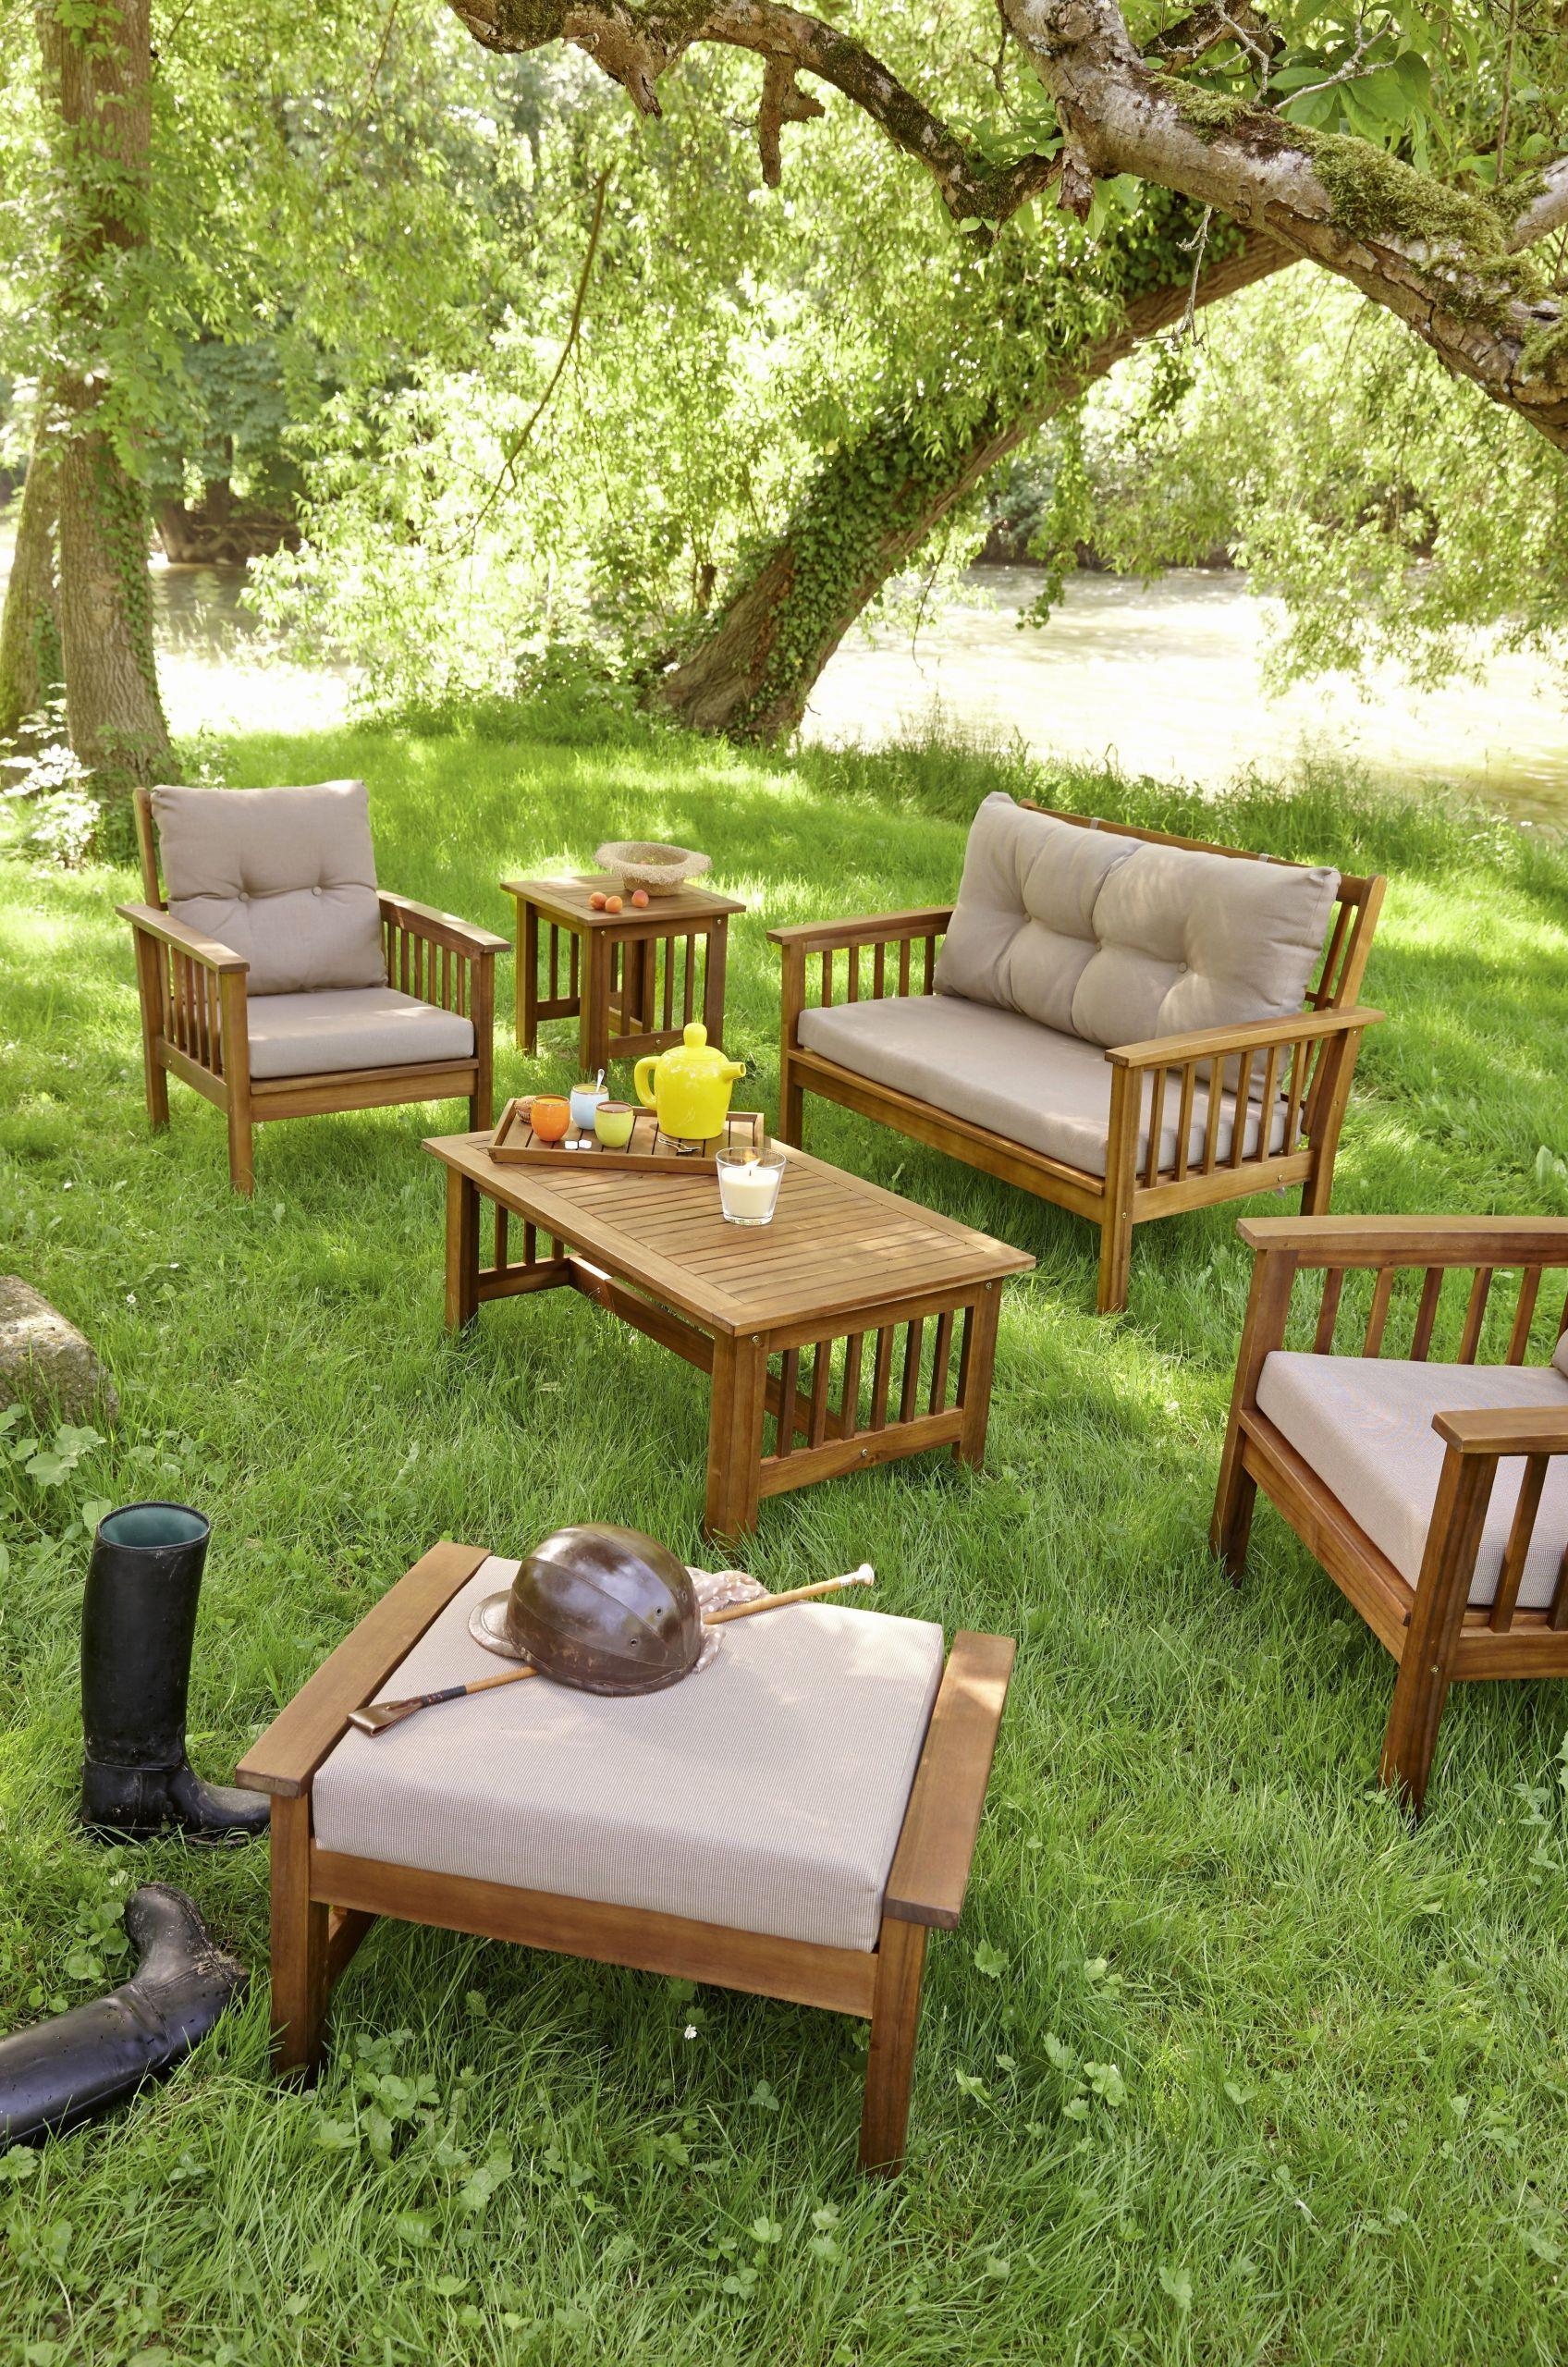 24 Charmant Table Et Banc De Jardin | Salon Jardin tout Banc De Jardin Leroy Merlin